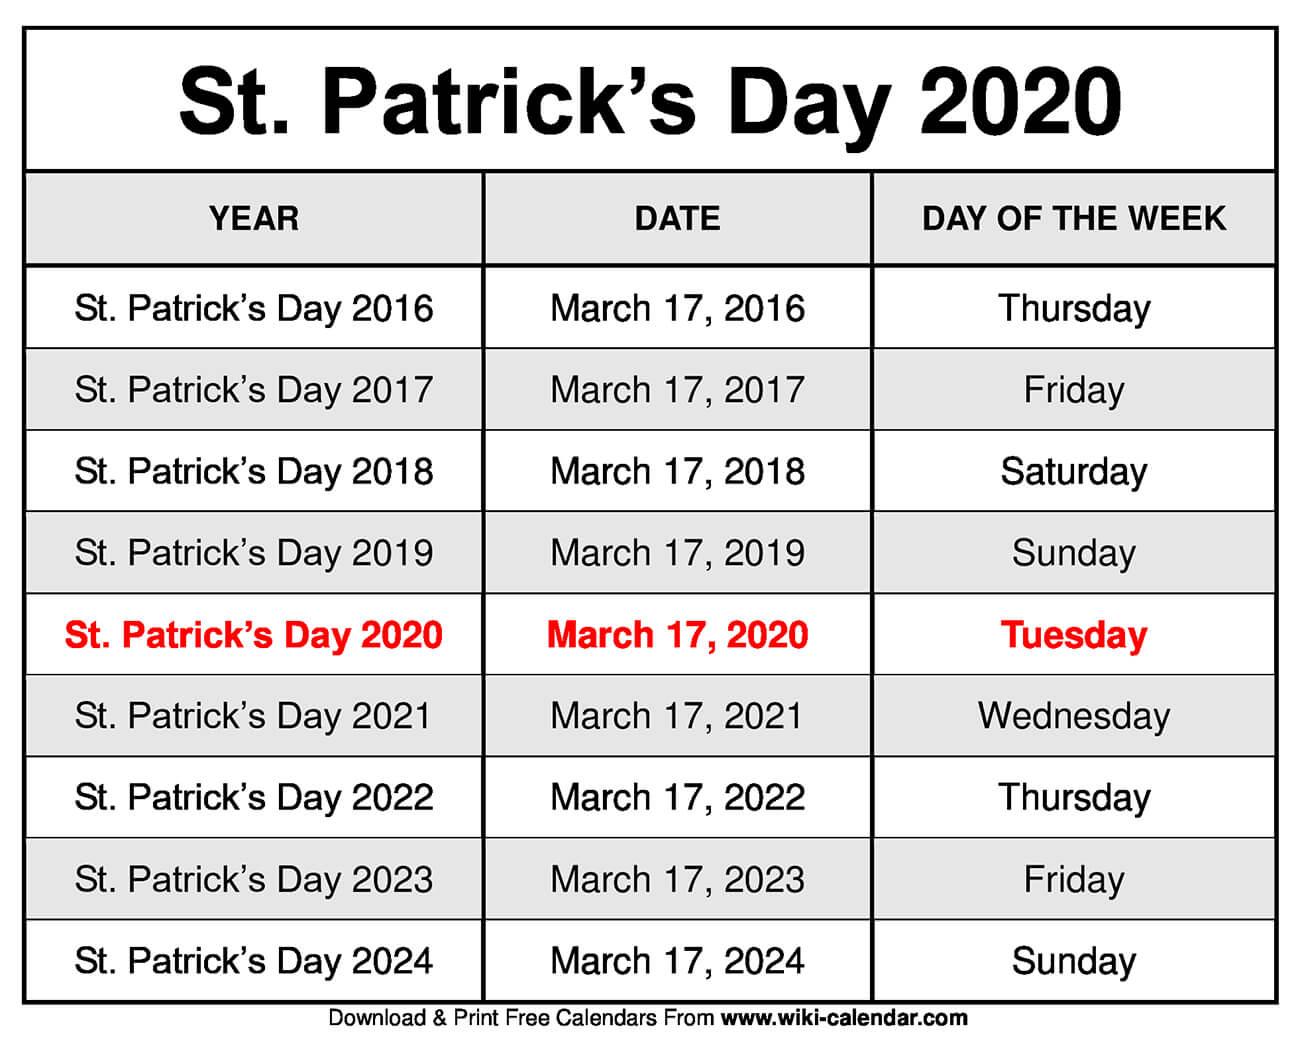 St. Patrick's Day 2020 Calendar